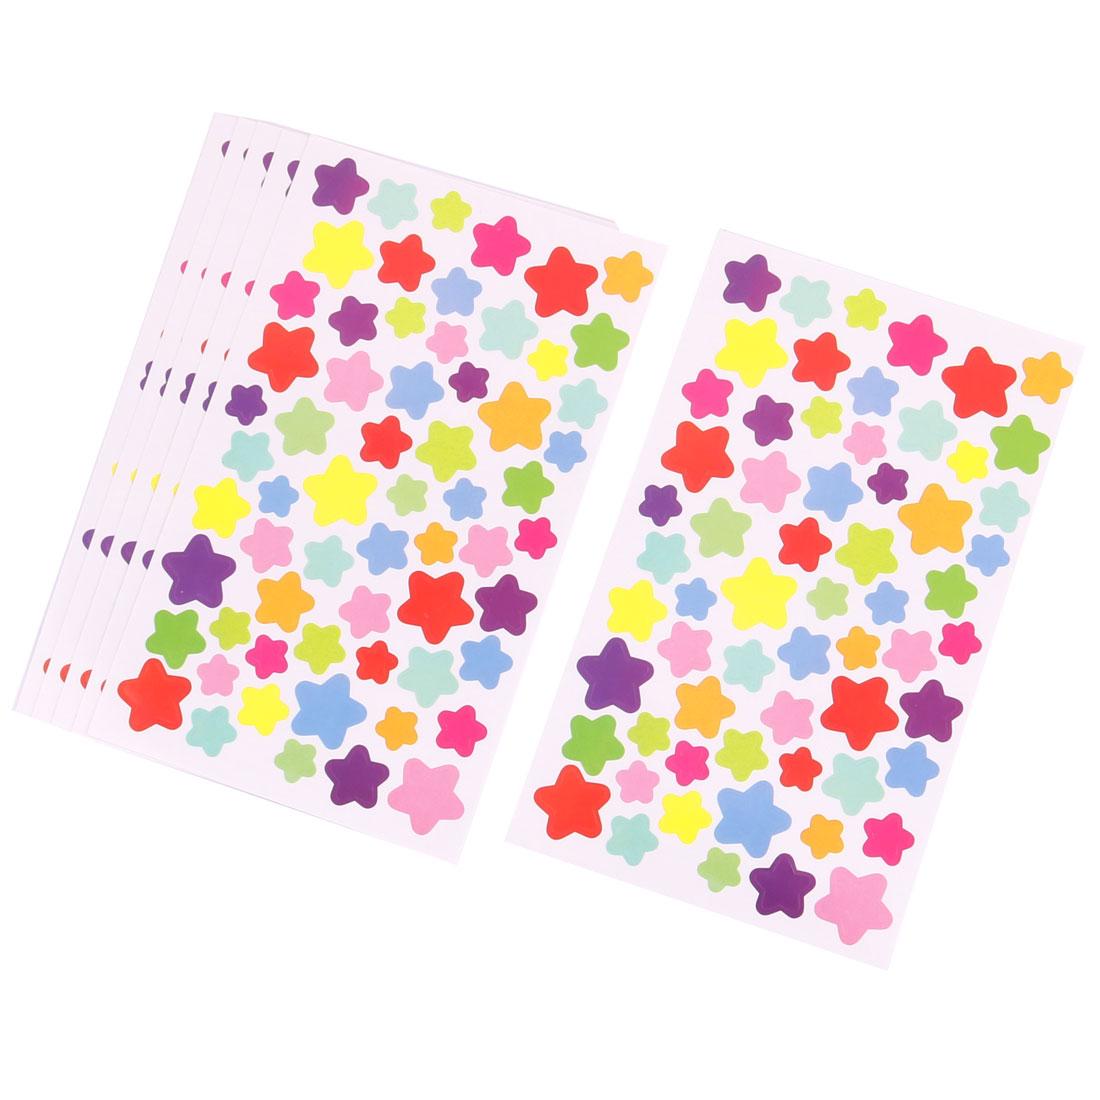 Home PVC Star Print DIY Book Album Sticker Removable Wall Decal Multicolor 6pcs